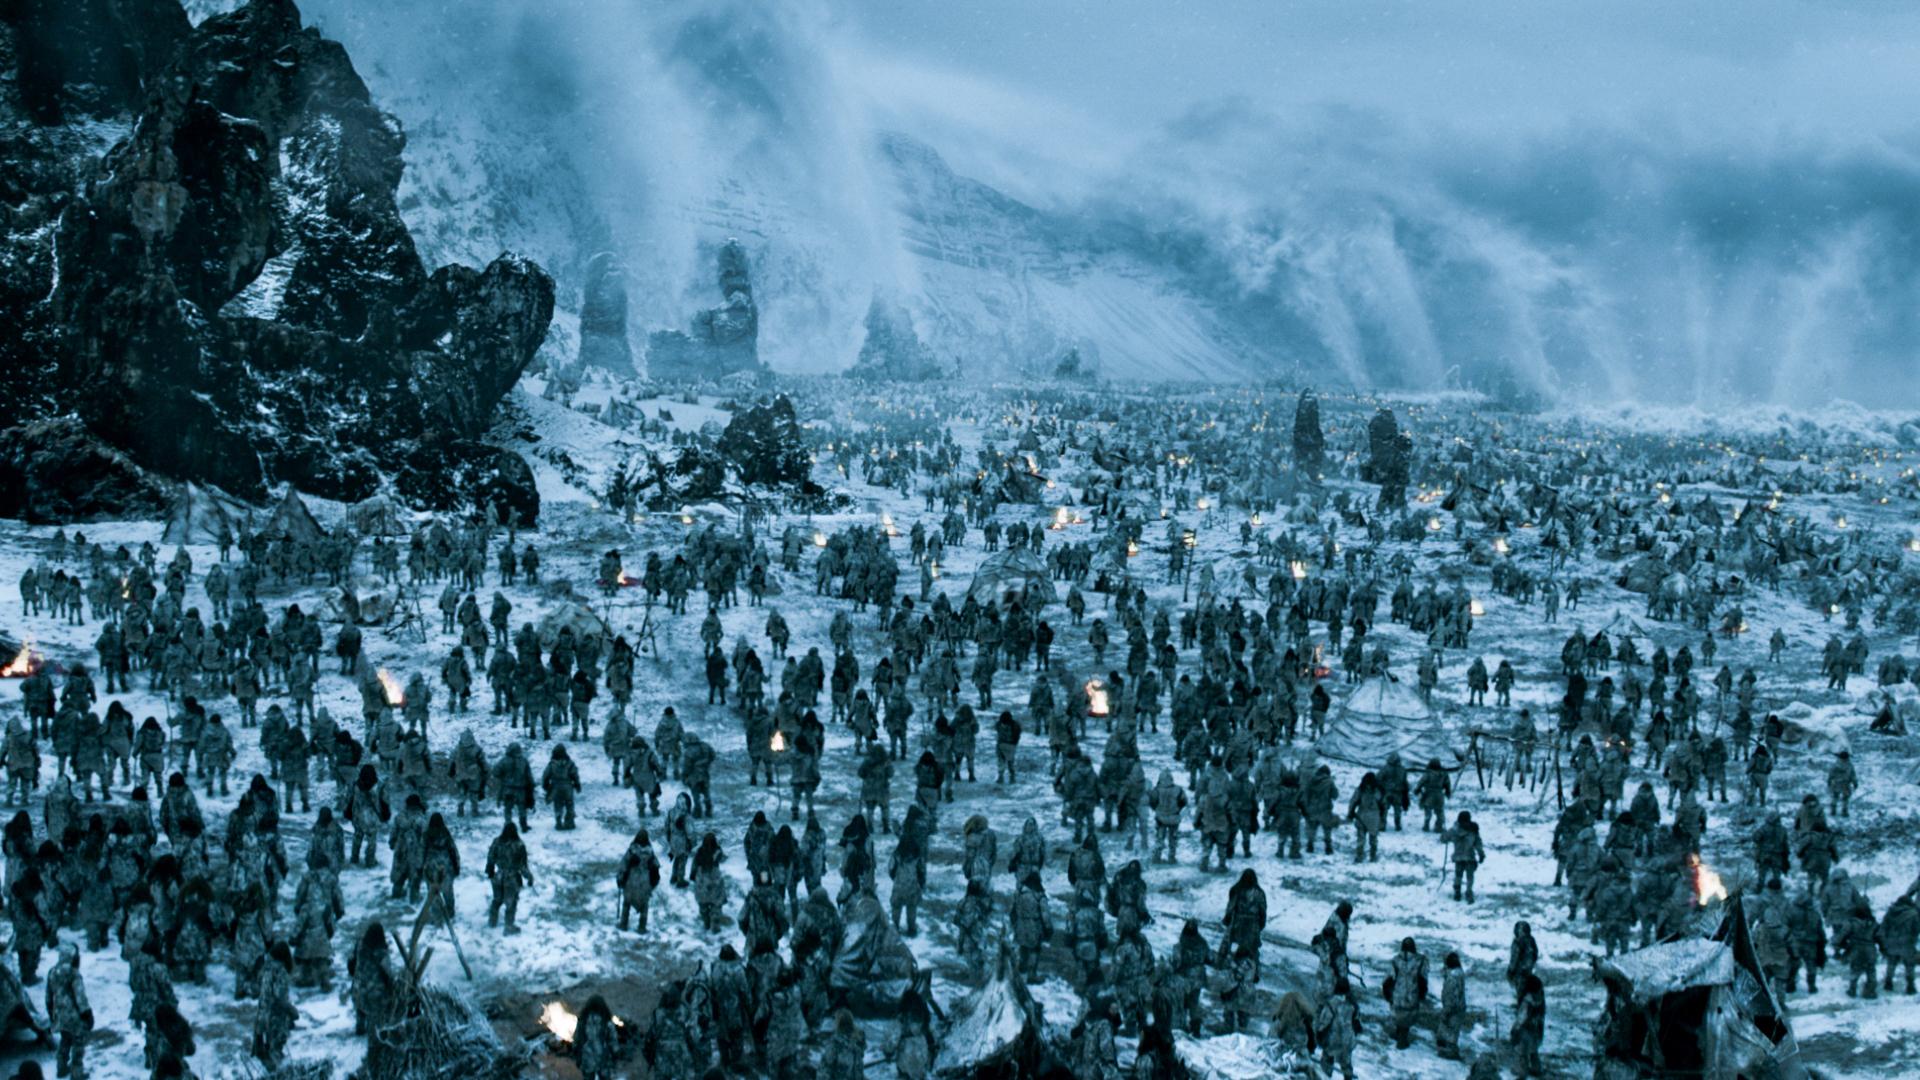 game of thrones white walker army night king season 8